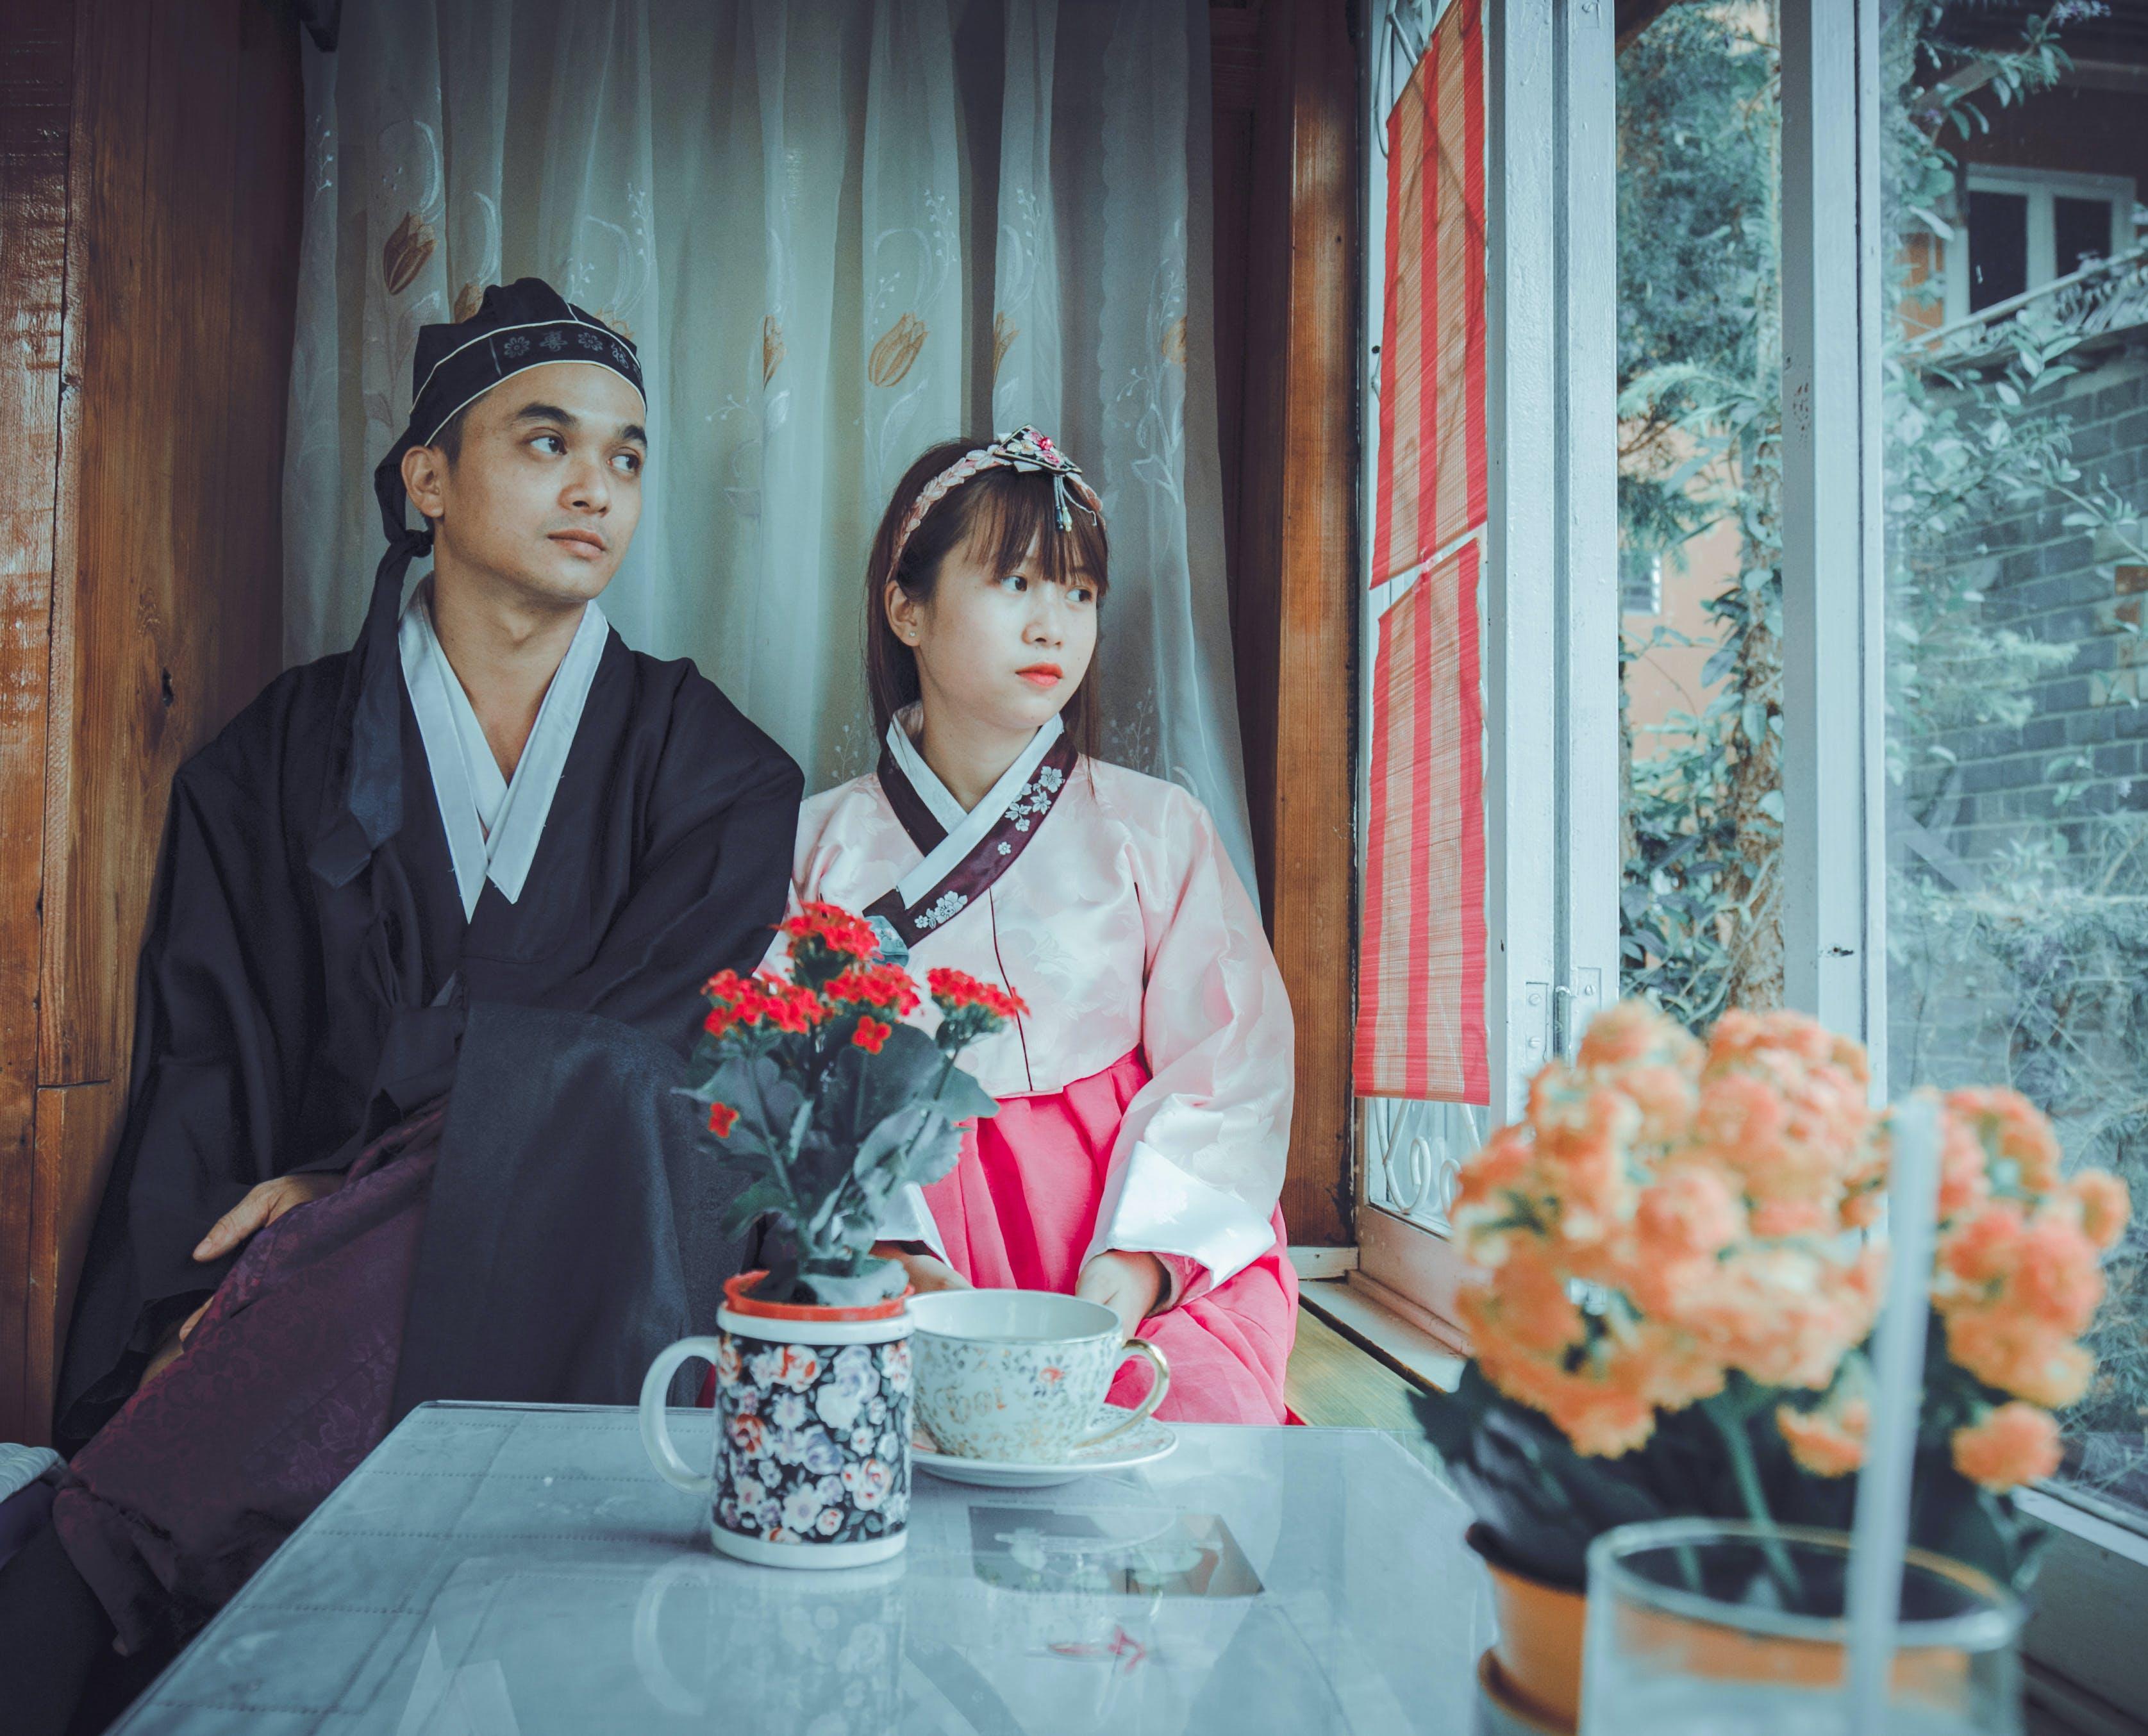 Couple Wearing Korean Traditional Dress Near Windowpane Staring at the Window